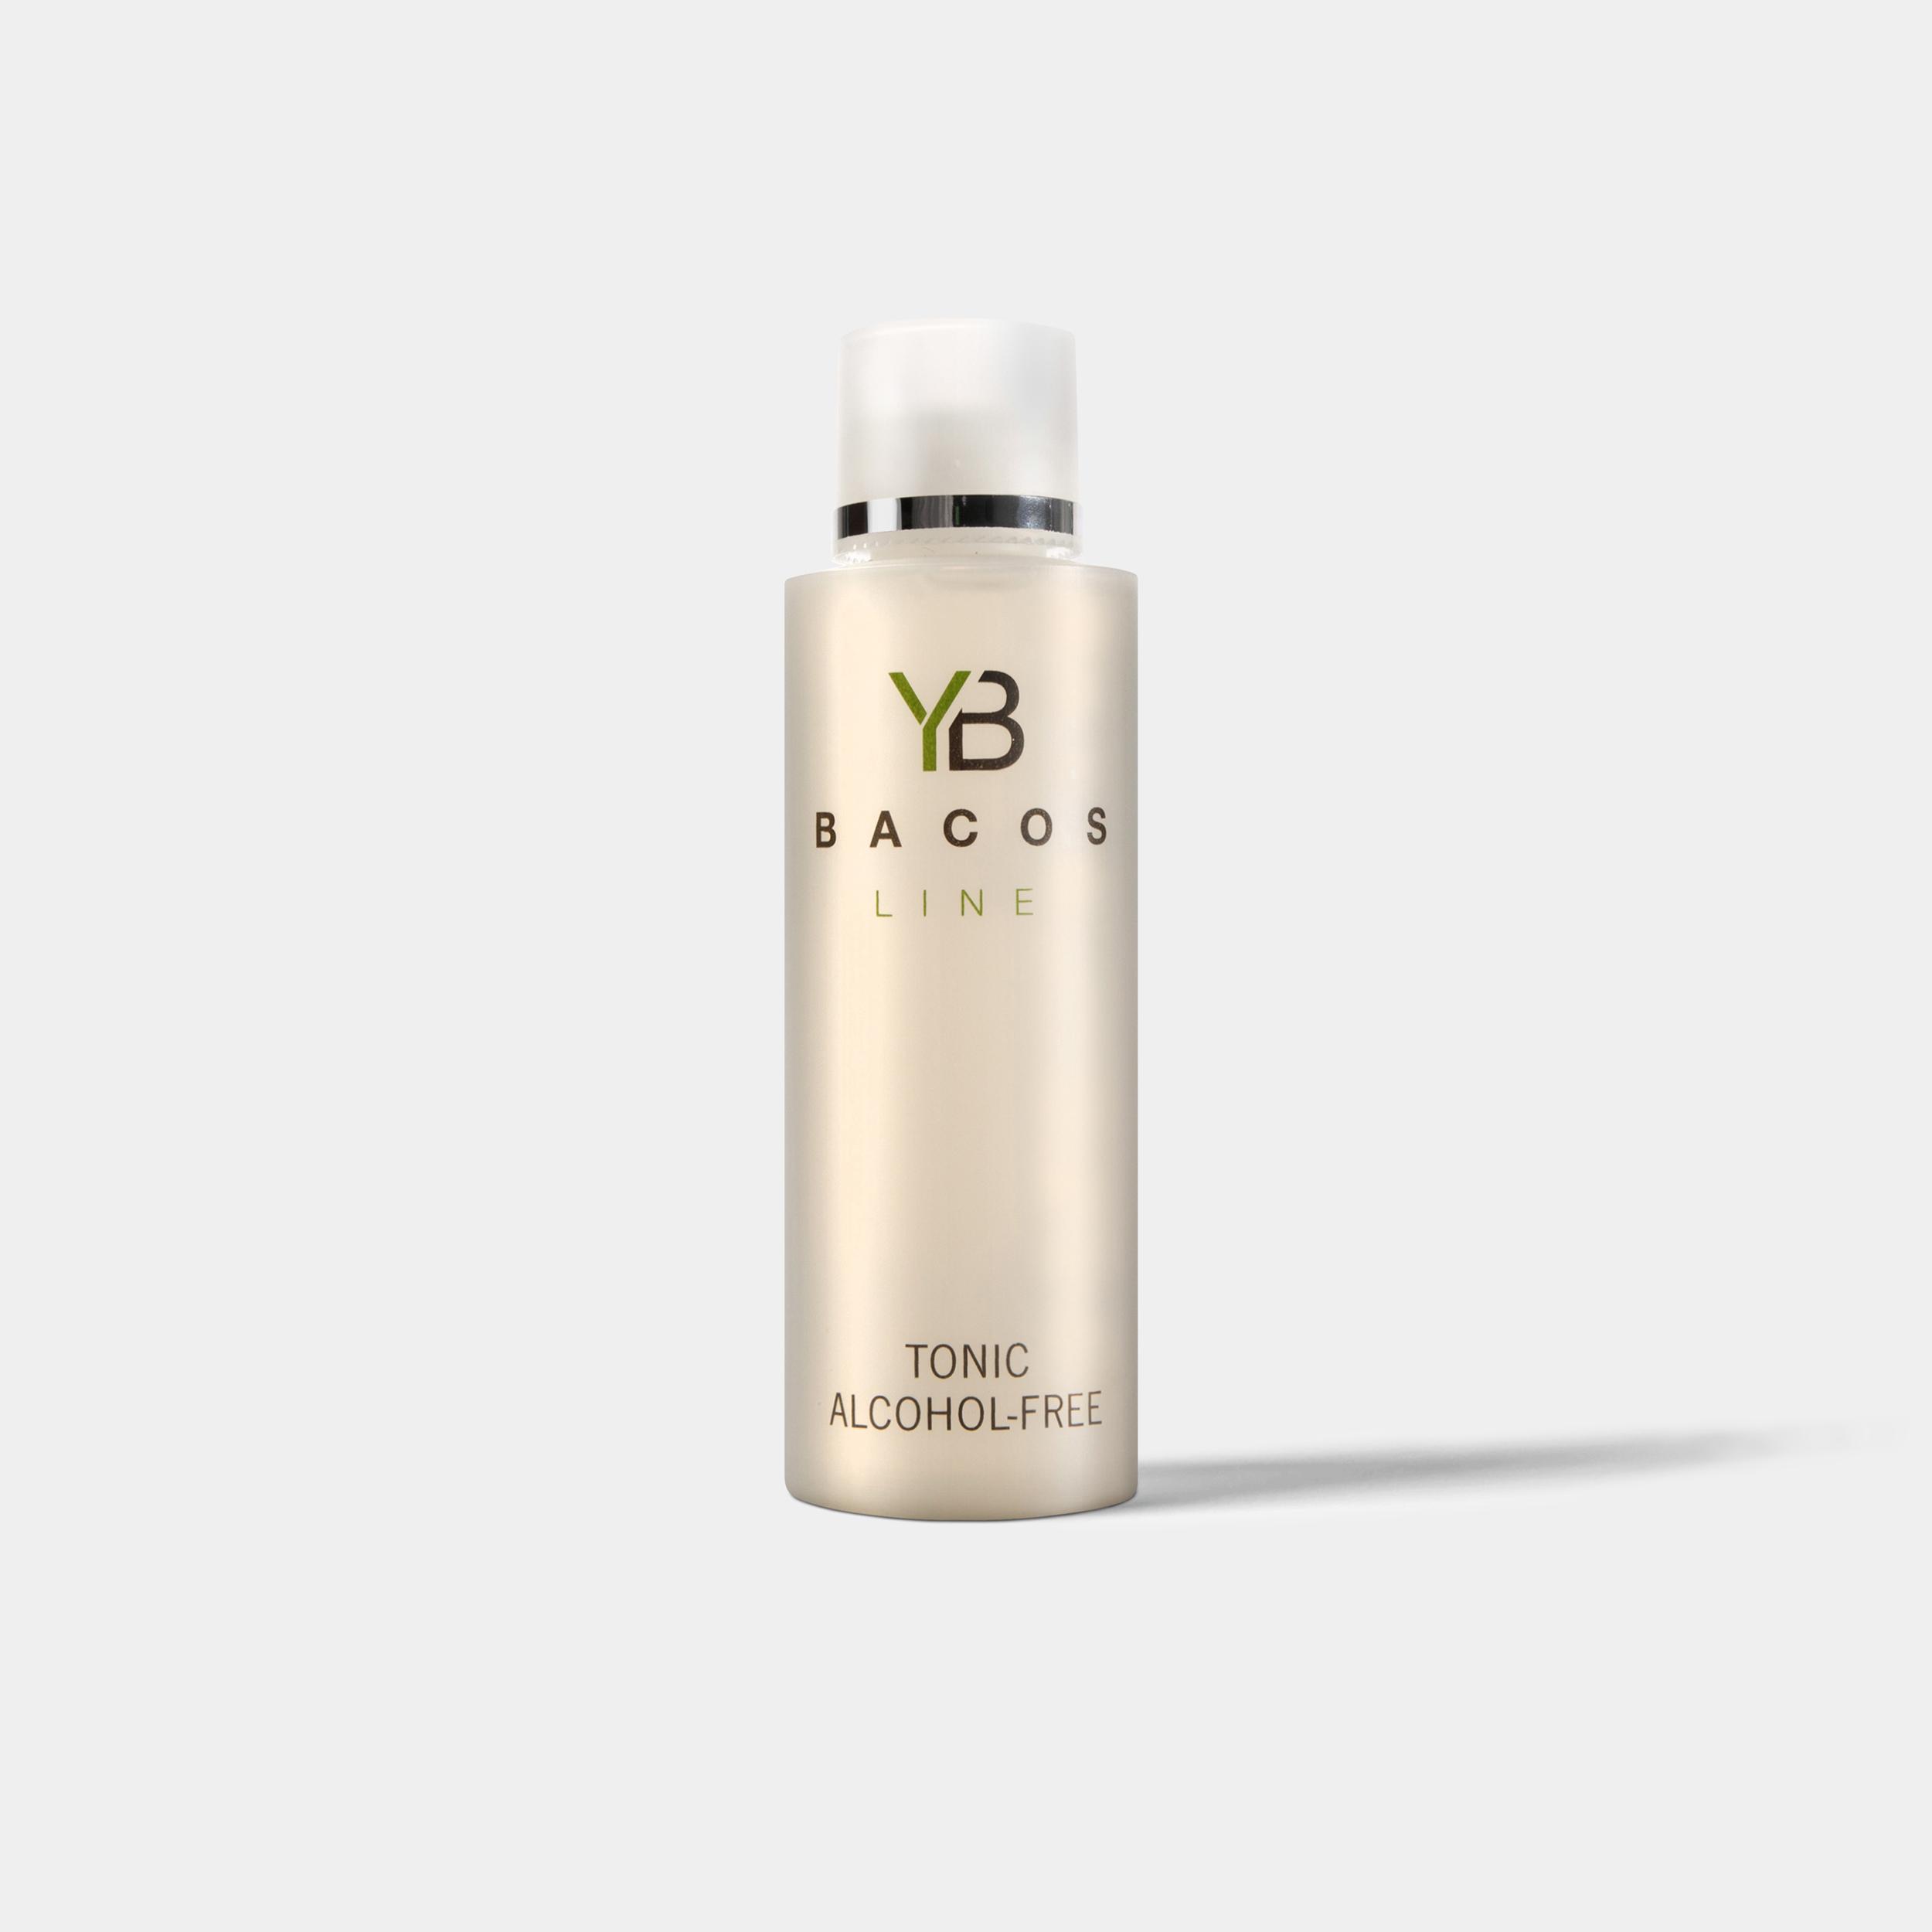 YB BACOS LINE TONIC (ALCOHOL FREE) - 200 ml